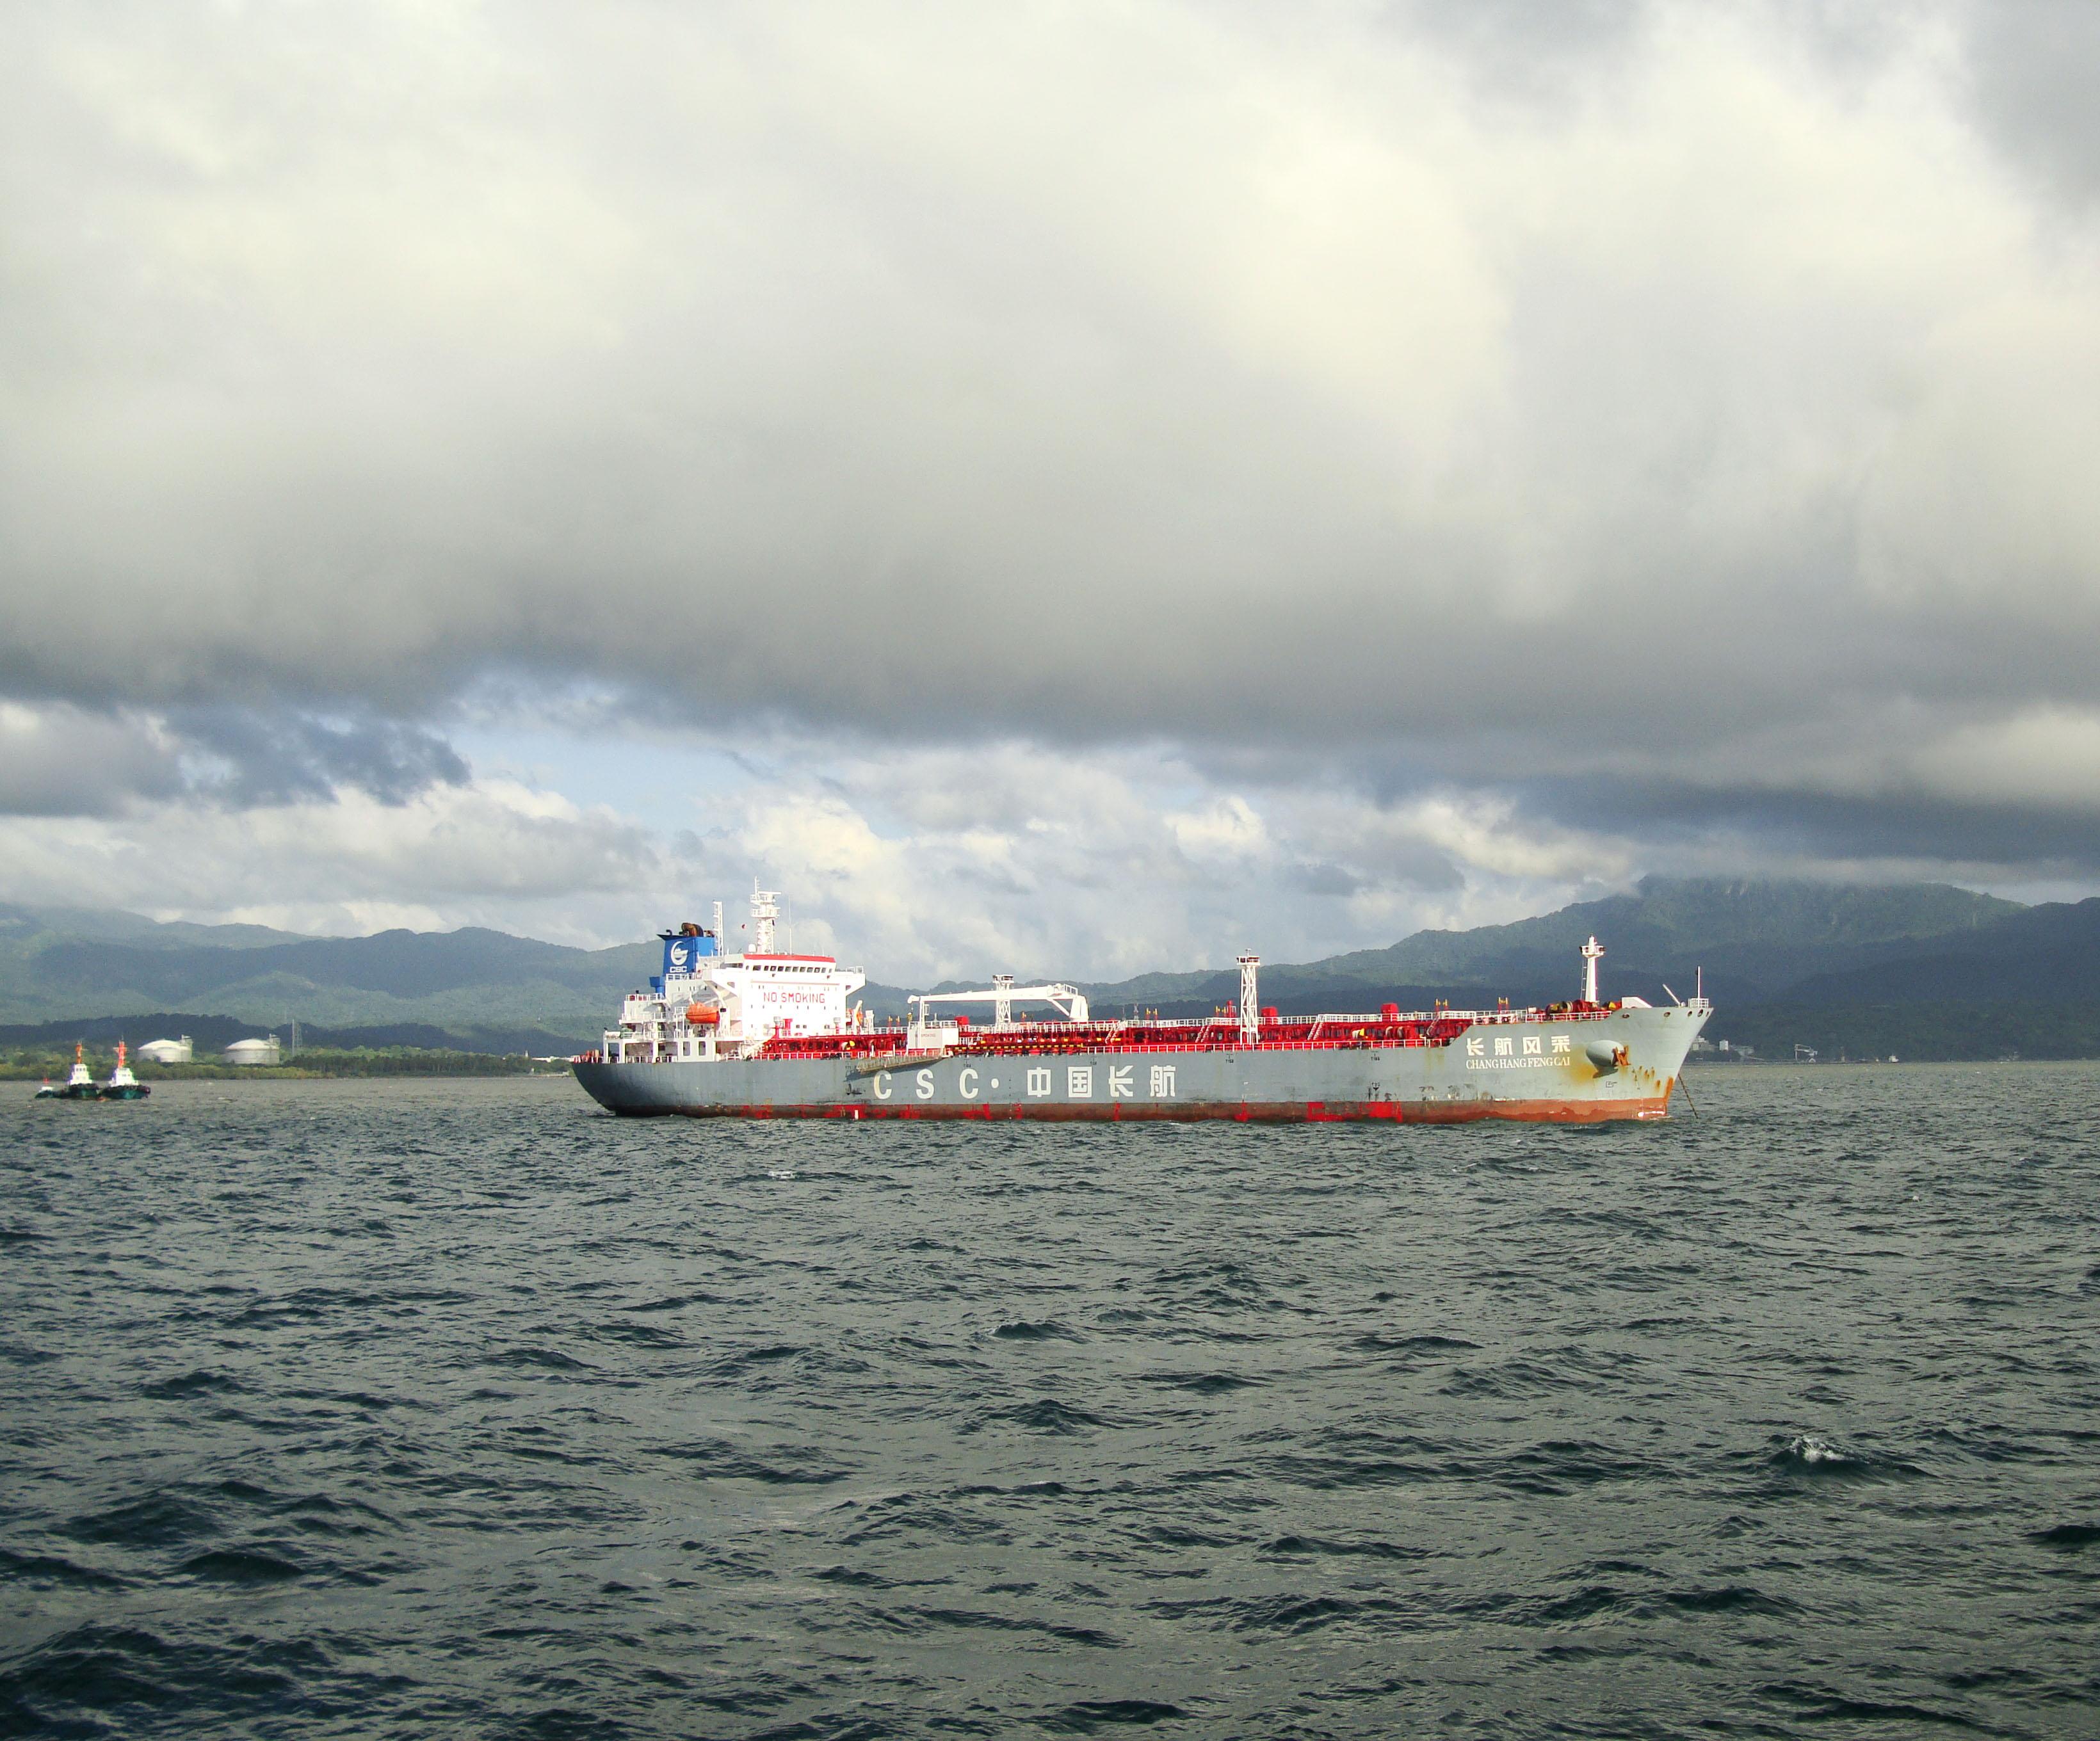 MV CSC Changhangfenggai Batangus Philppines 2010 04